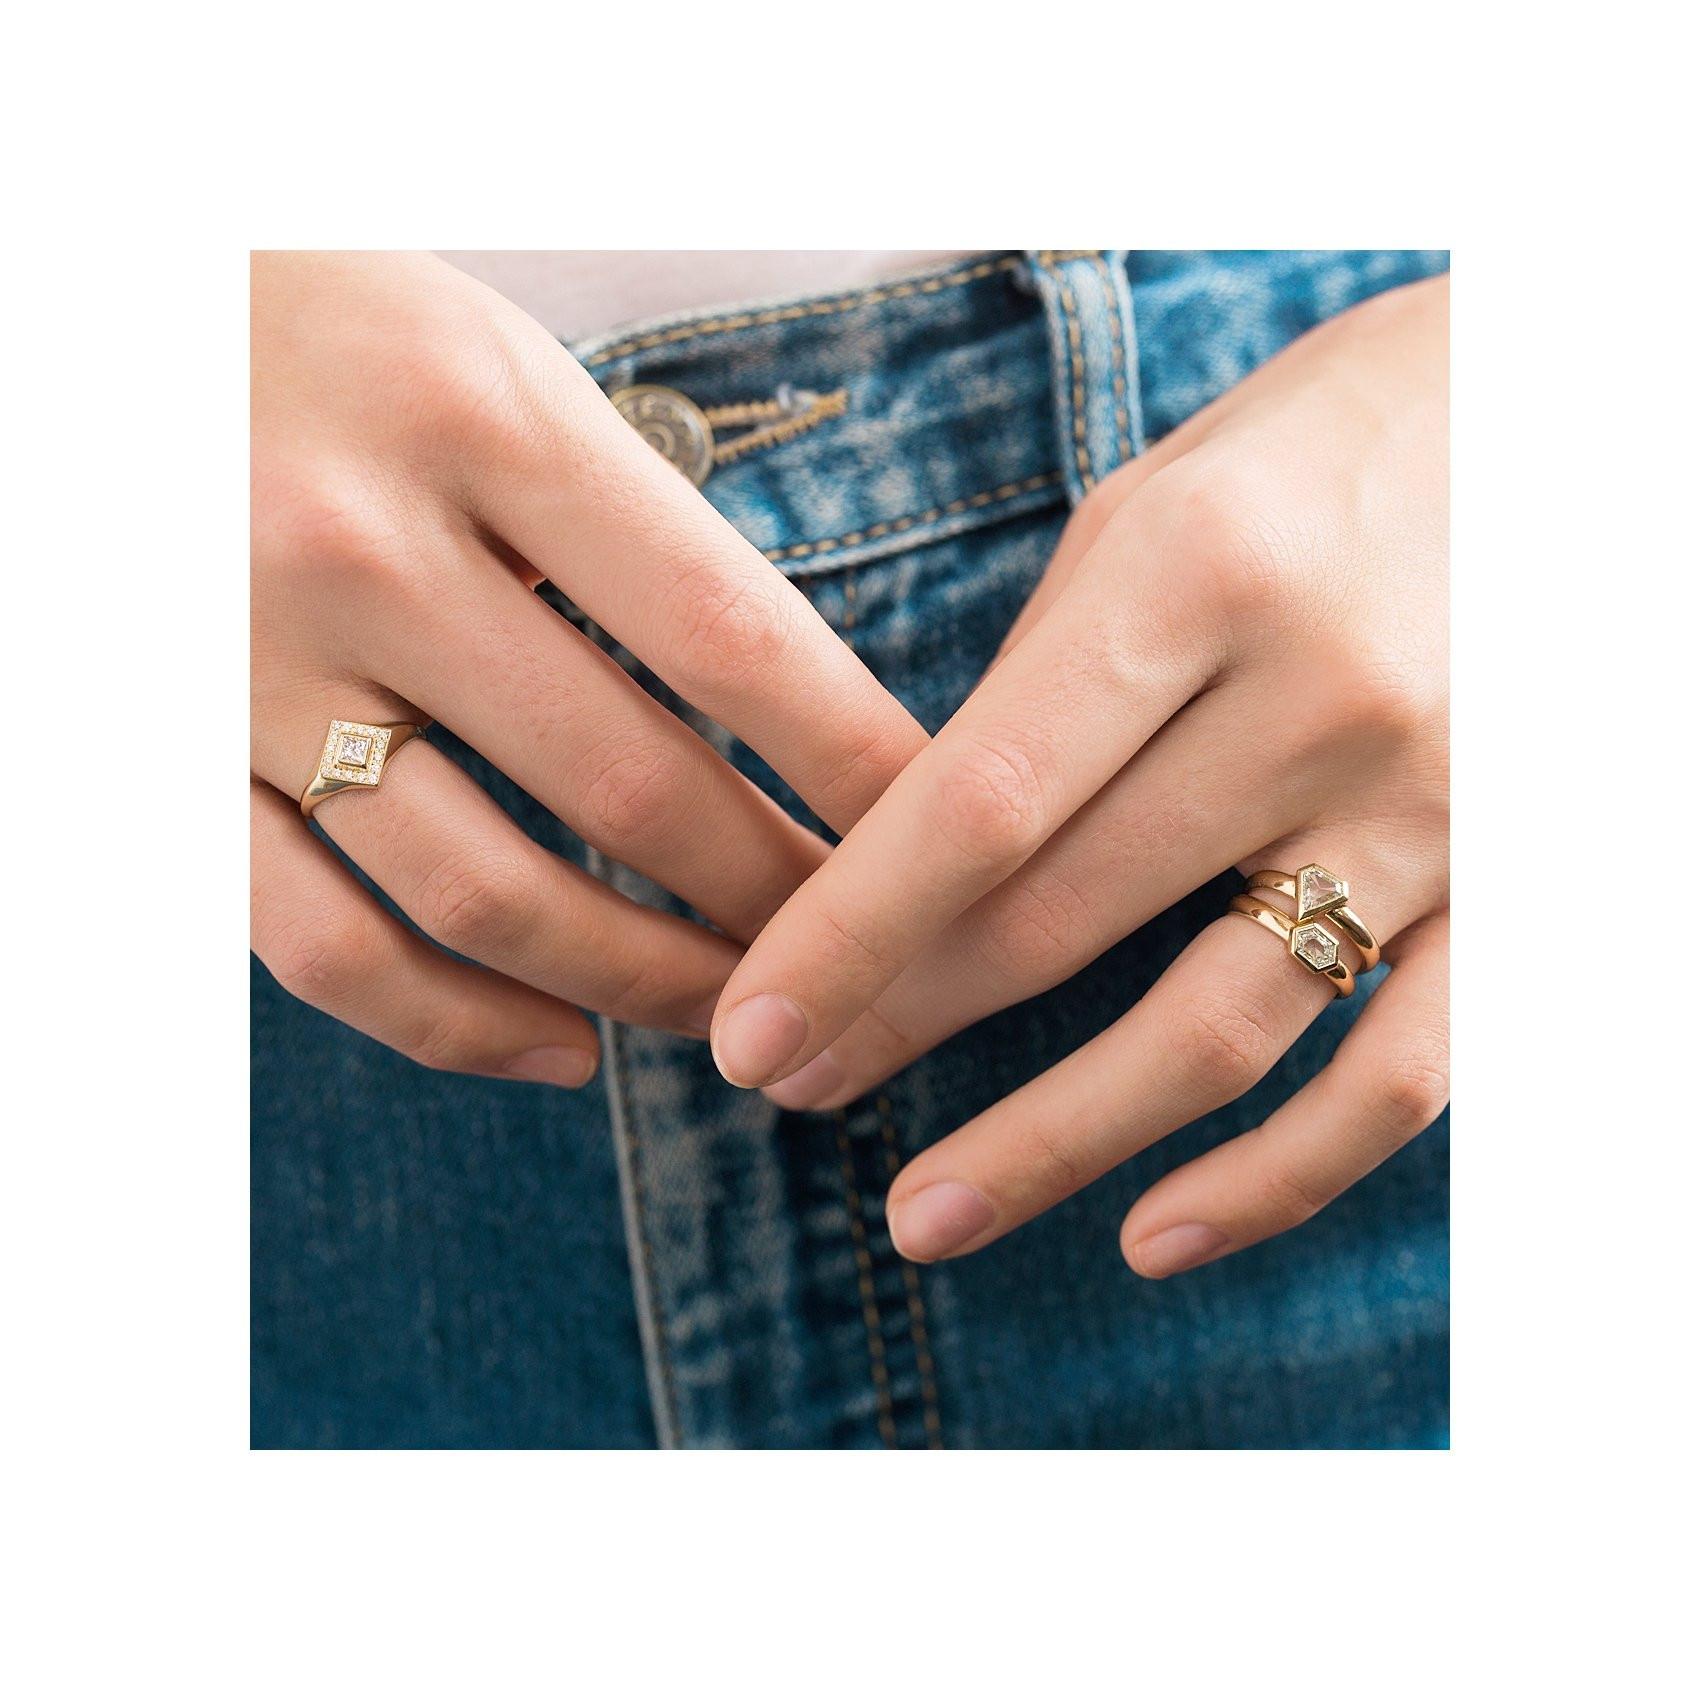 Zoe Chicco Diamond Pave Signet Ring on model